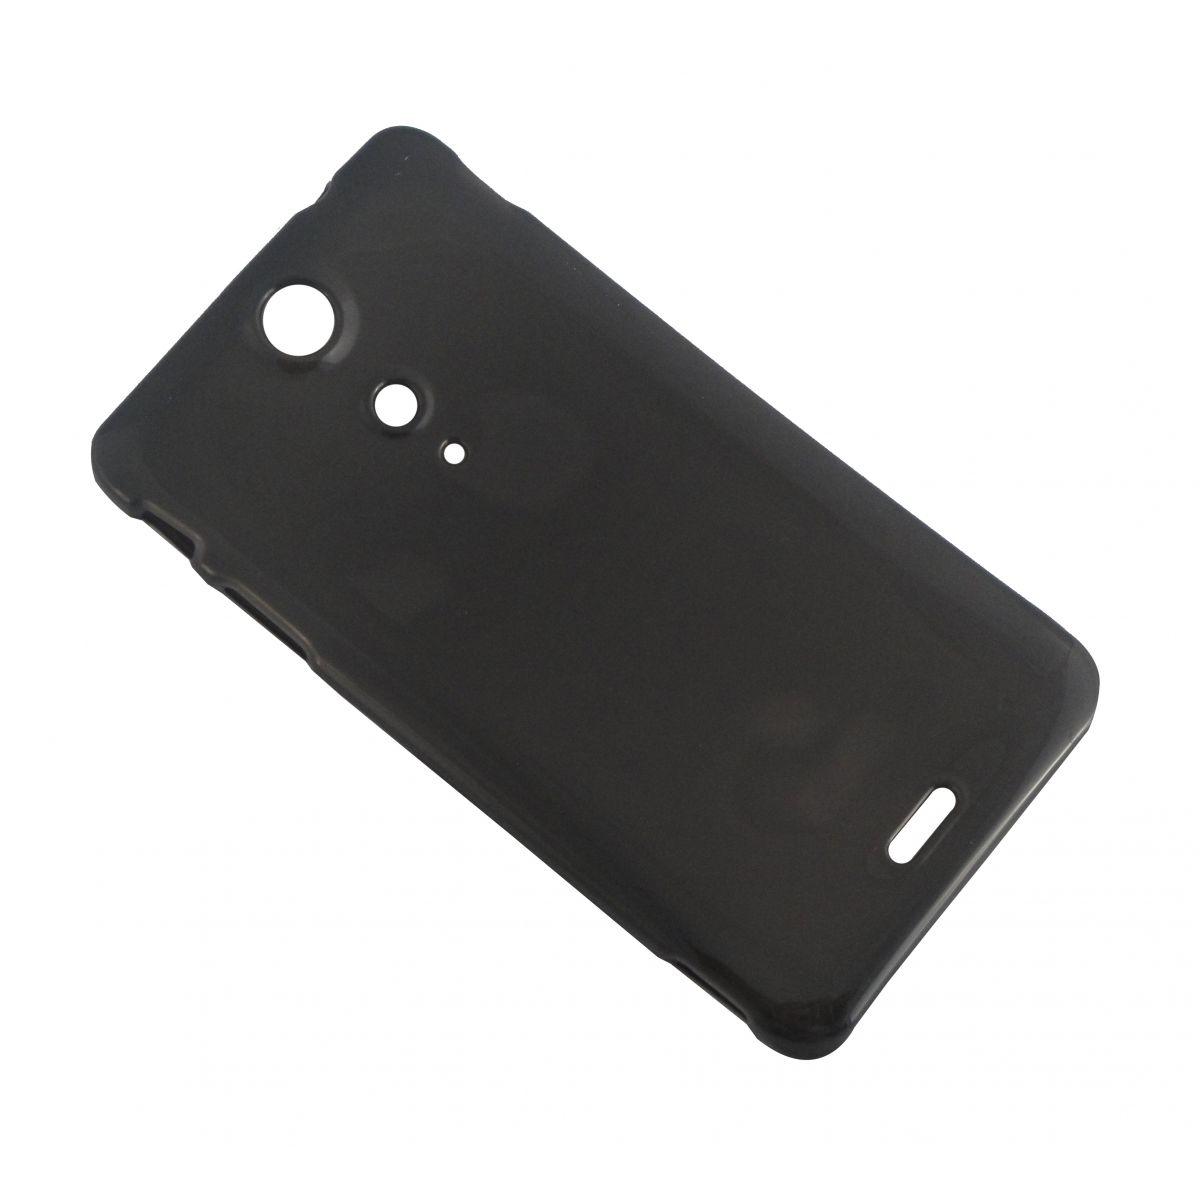 Capa de TPU para Sony Xperia Lt29i Xperia TX GX + Pelicula Grafite